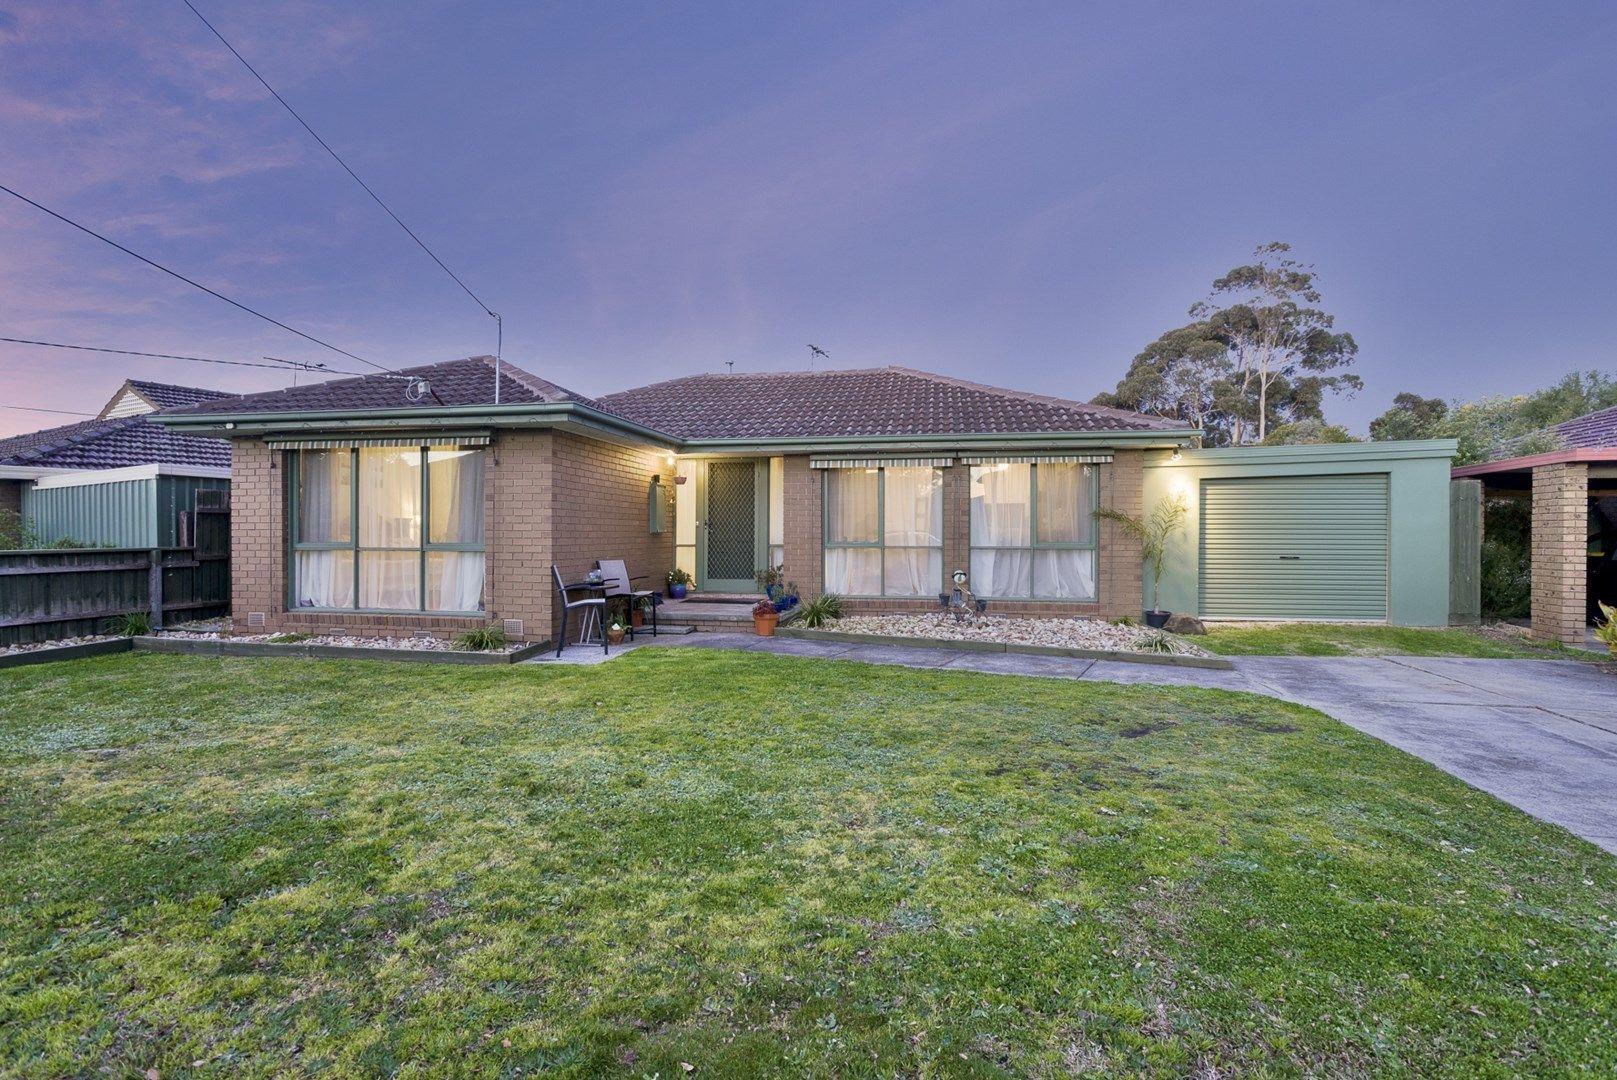 10 Melville Close, Keilor VIC 3036, Image 0